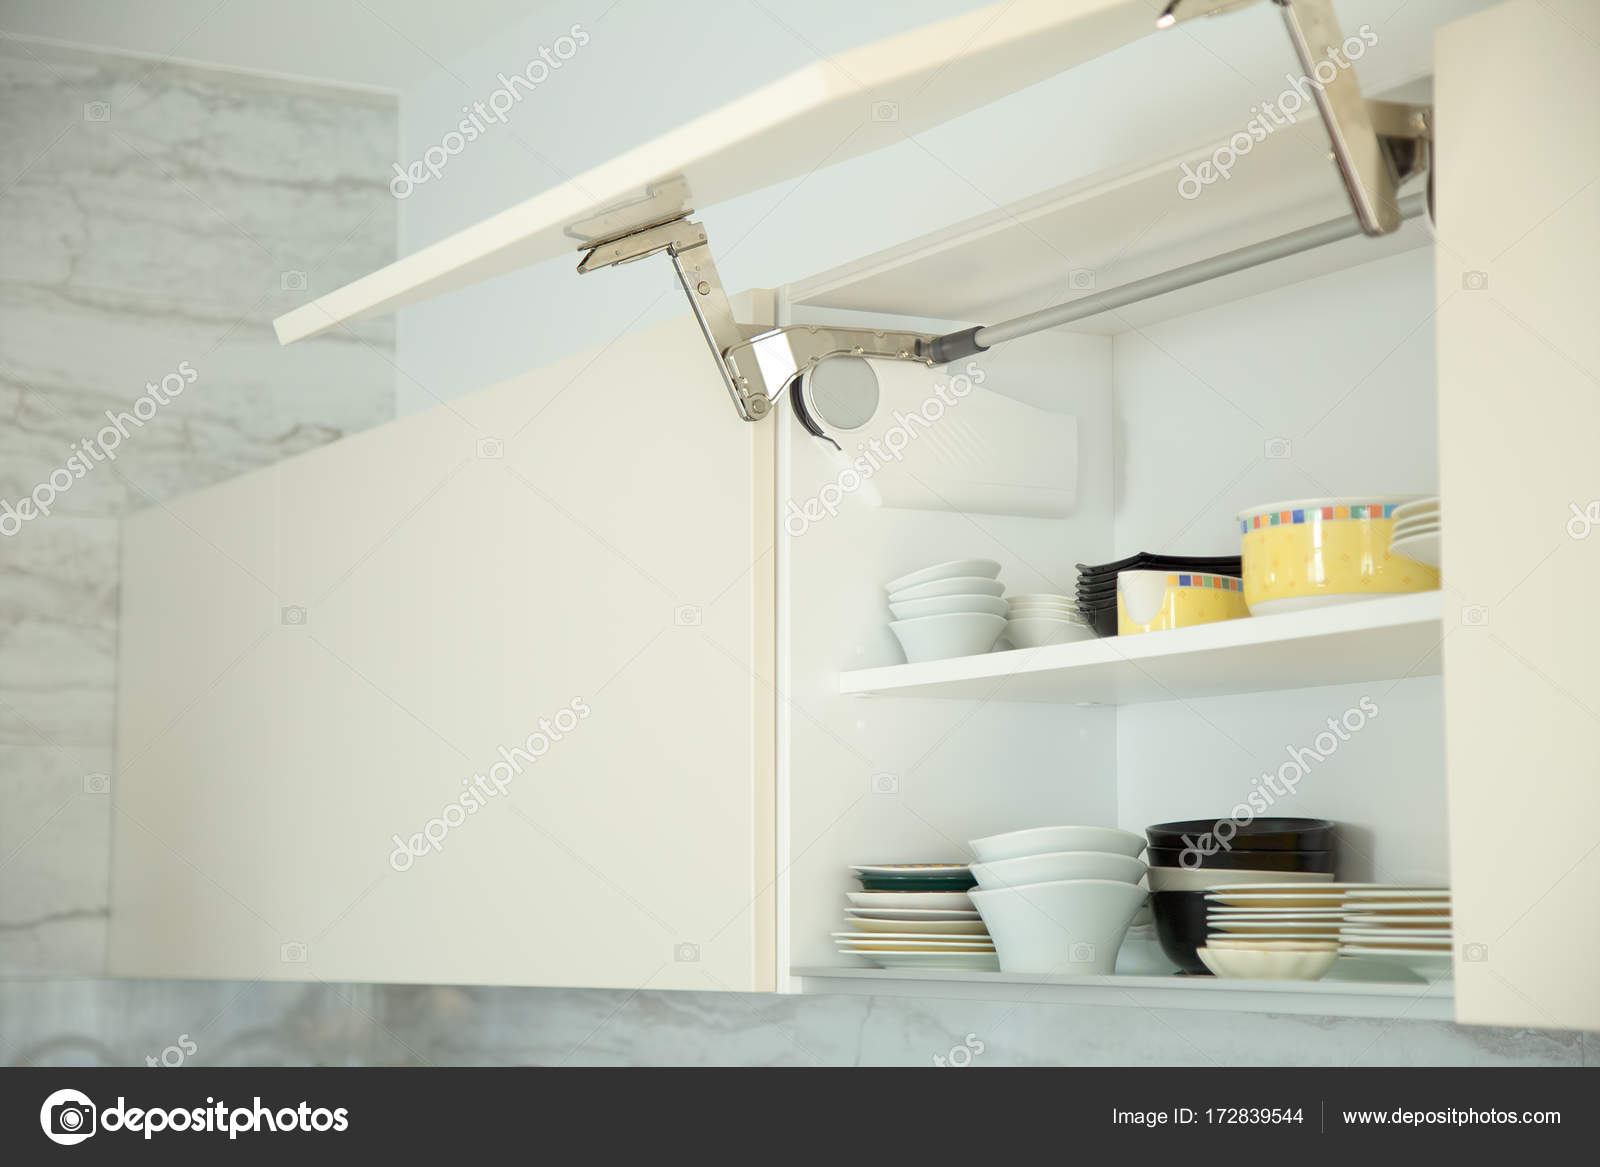 Küche Schrank furnitire — Stockfoto © Aleksashka_89 #172839544